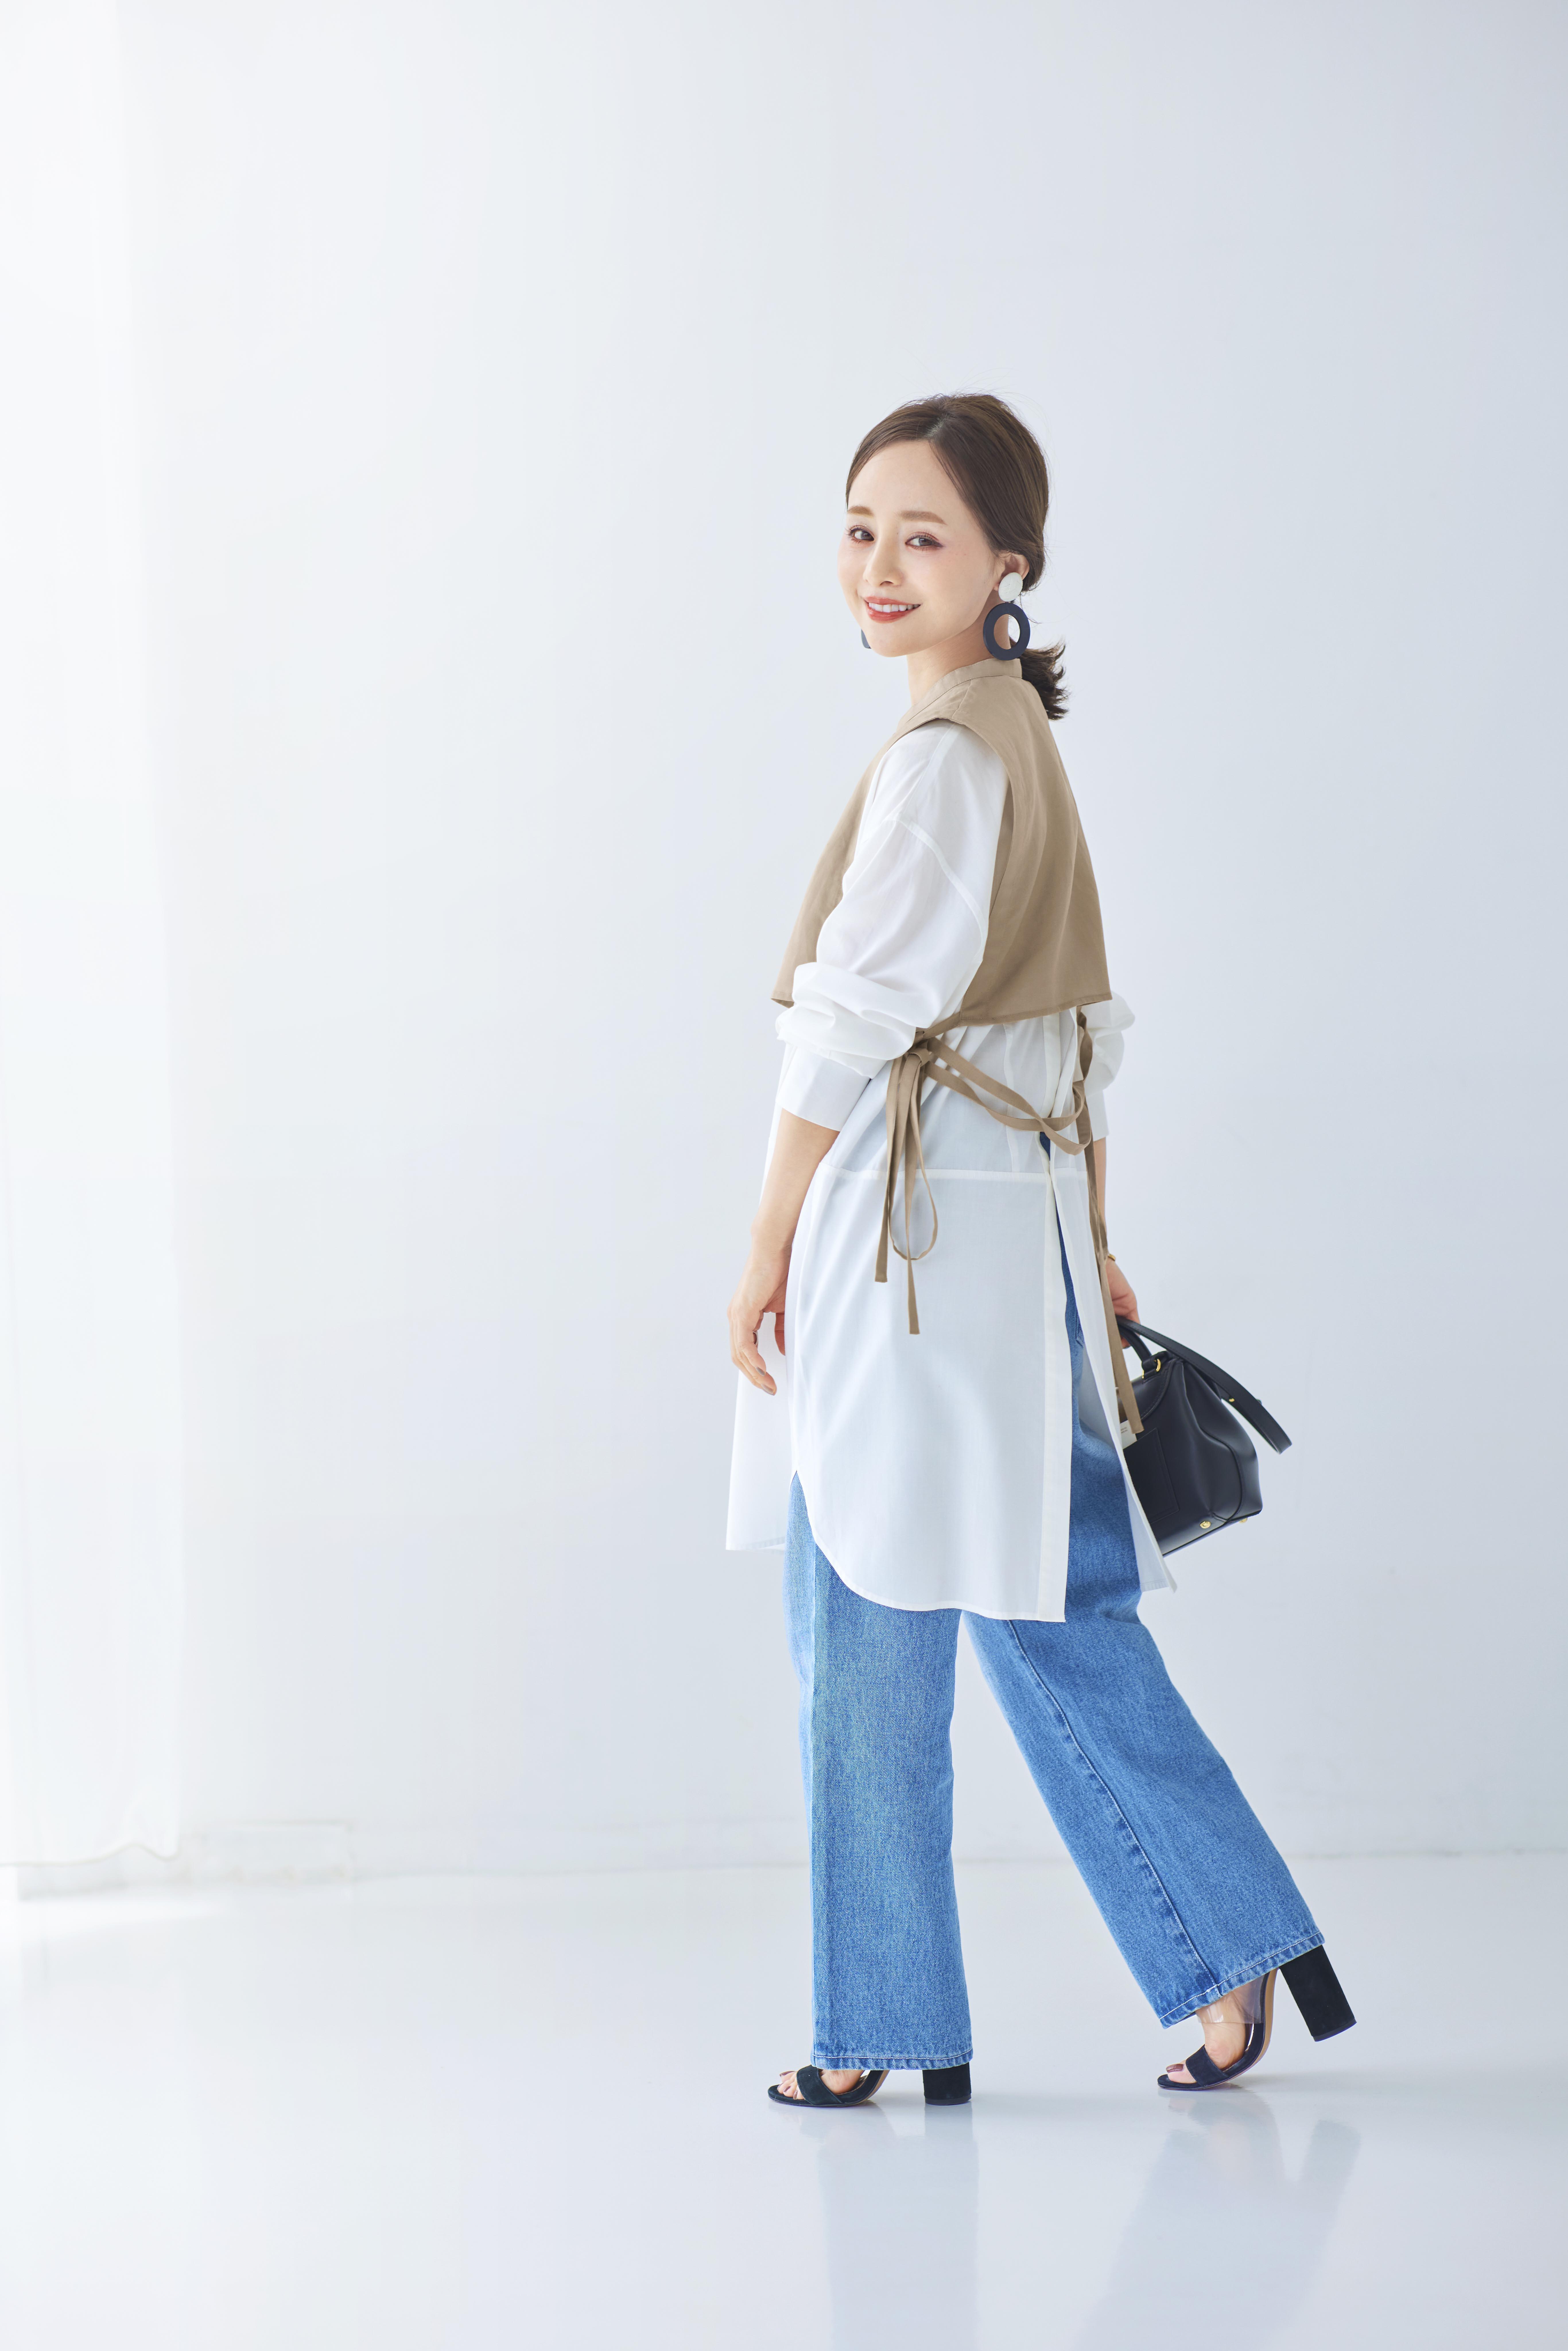 https://kotochika.kyoto/topics/7f1462b701fa2adea6a68a55f7784e71cf3f1f18.jpg